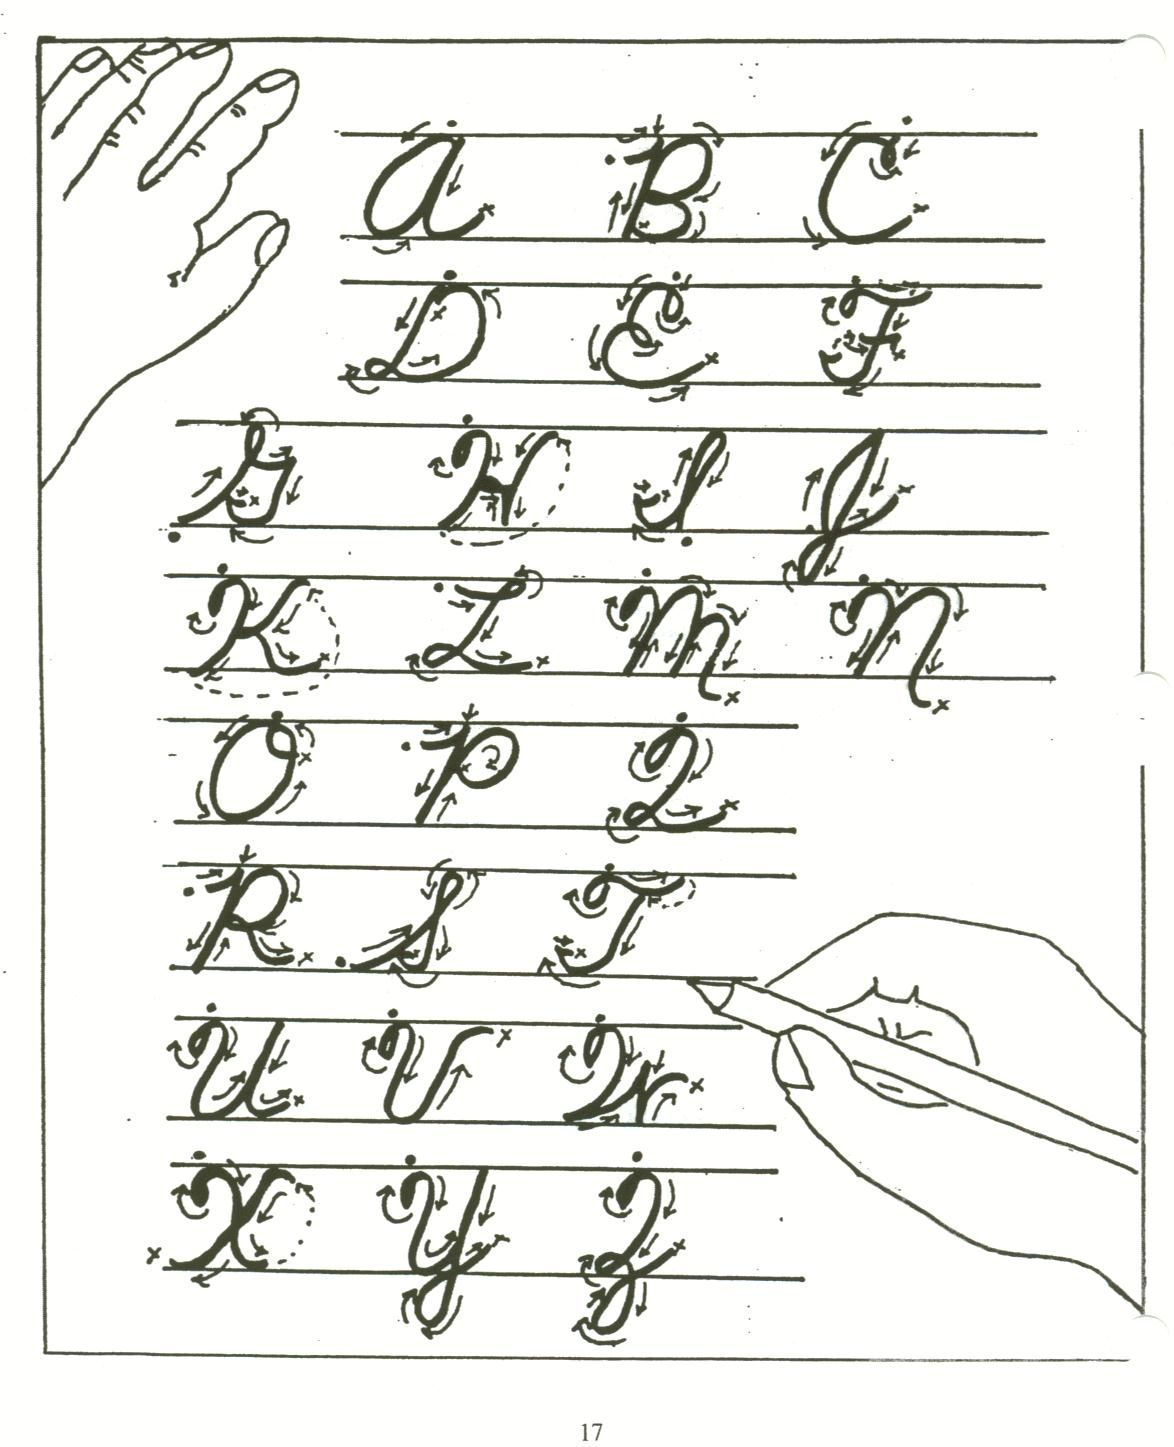 Is Handwriting So Last Generation Redux